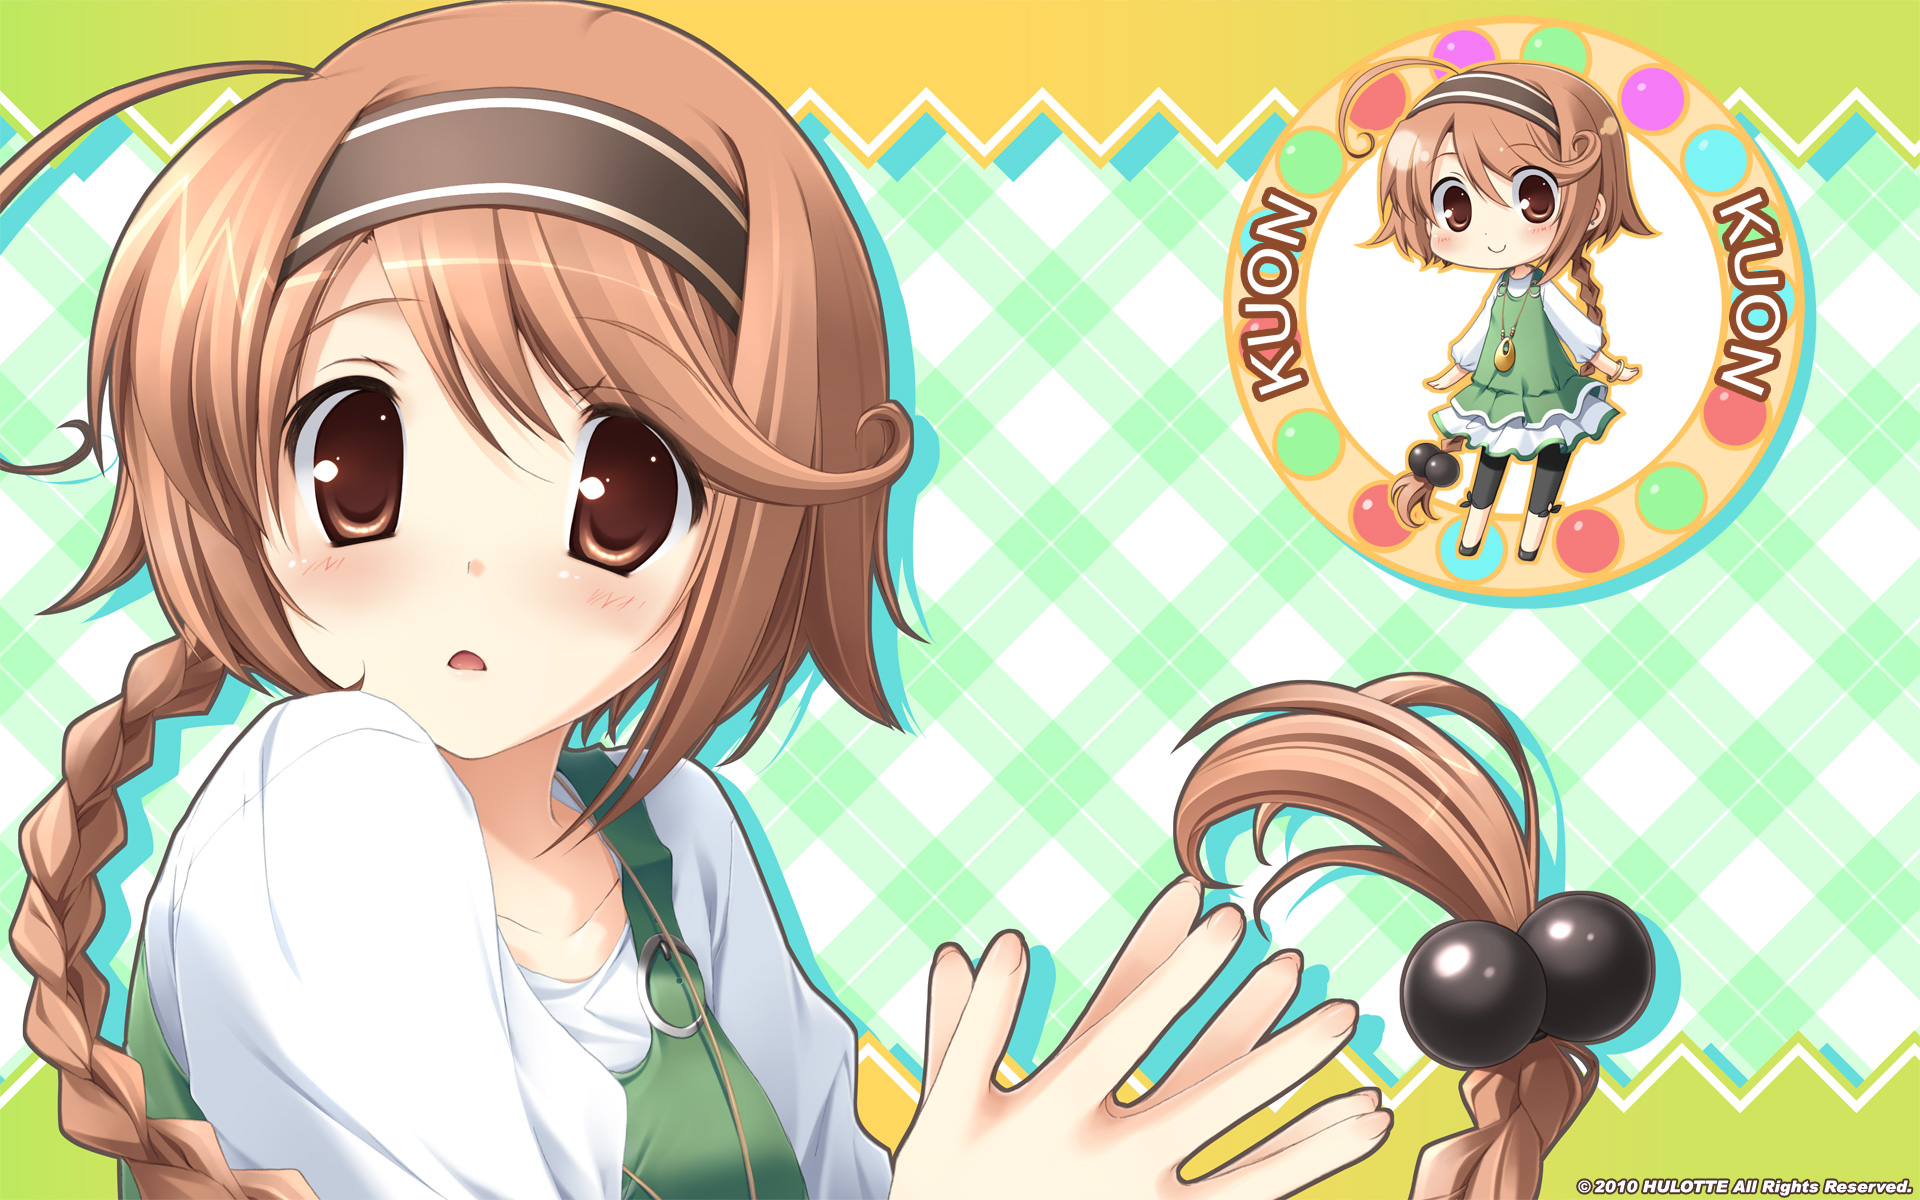 Cute Girl Wallpaper Pack 17 Konachancom 80599 brown eyes chibi 1920x1200